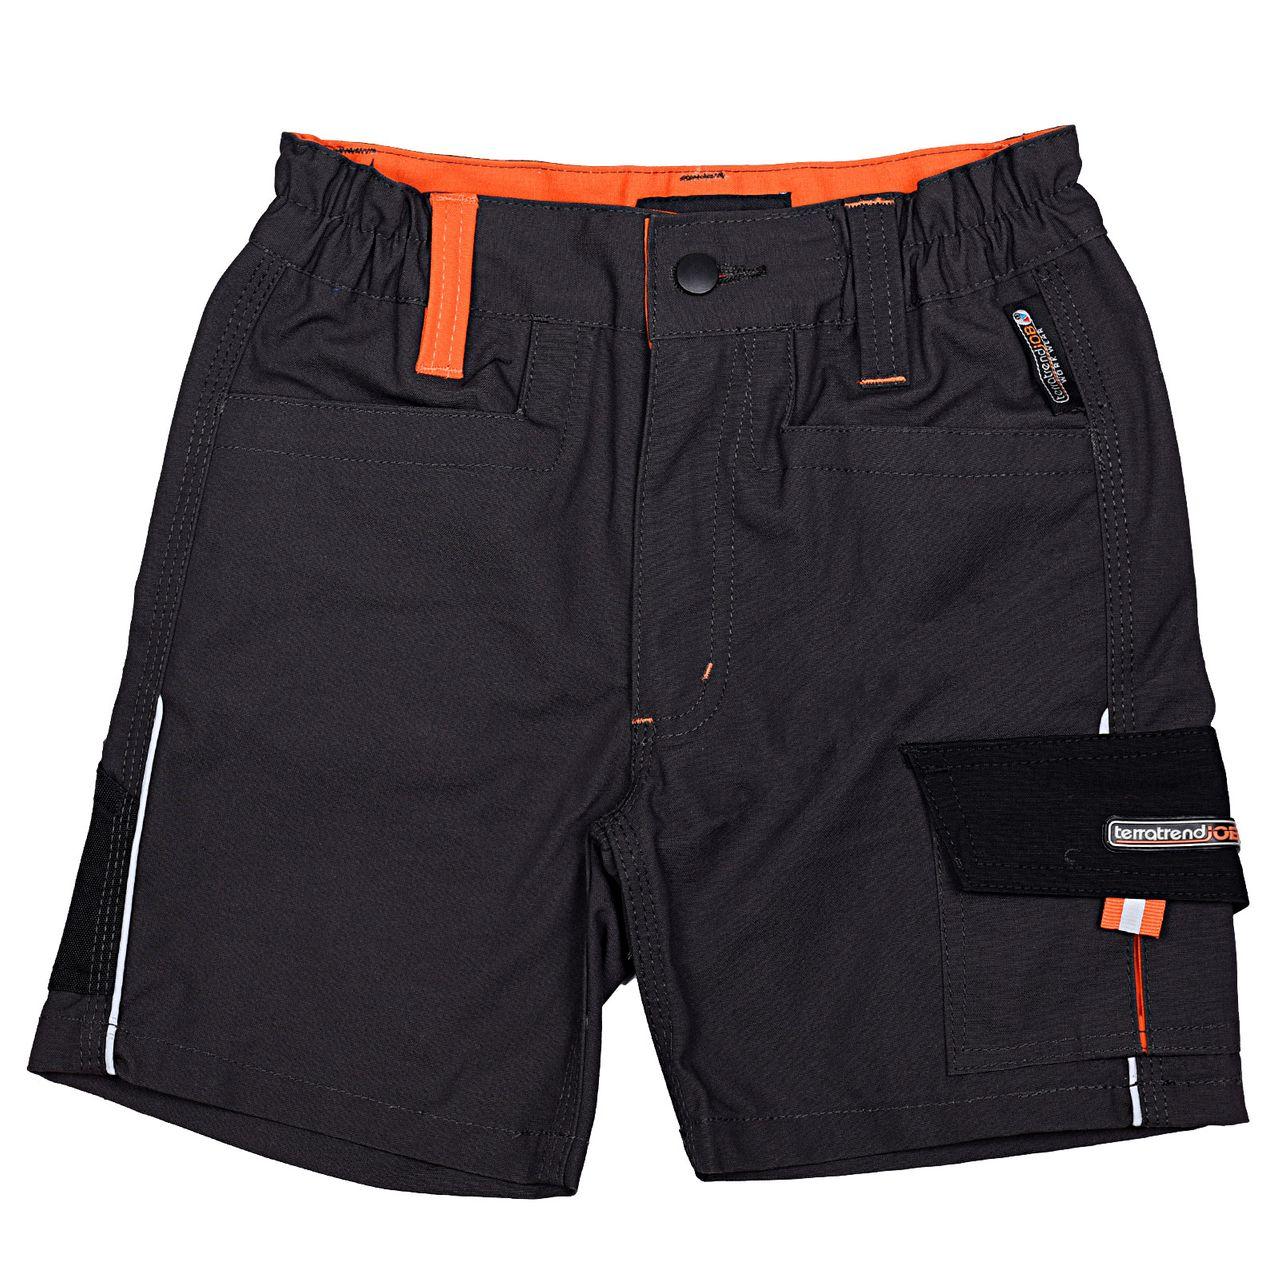 TERRATREND JOB Revolution Kinder-Shorts, Dunkelgrau